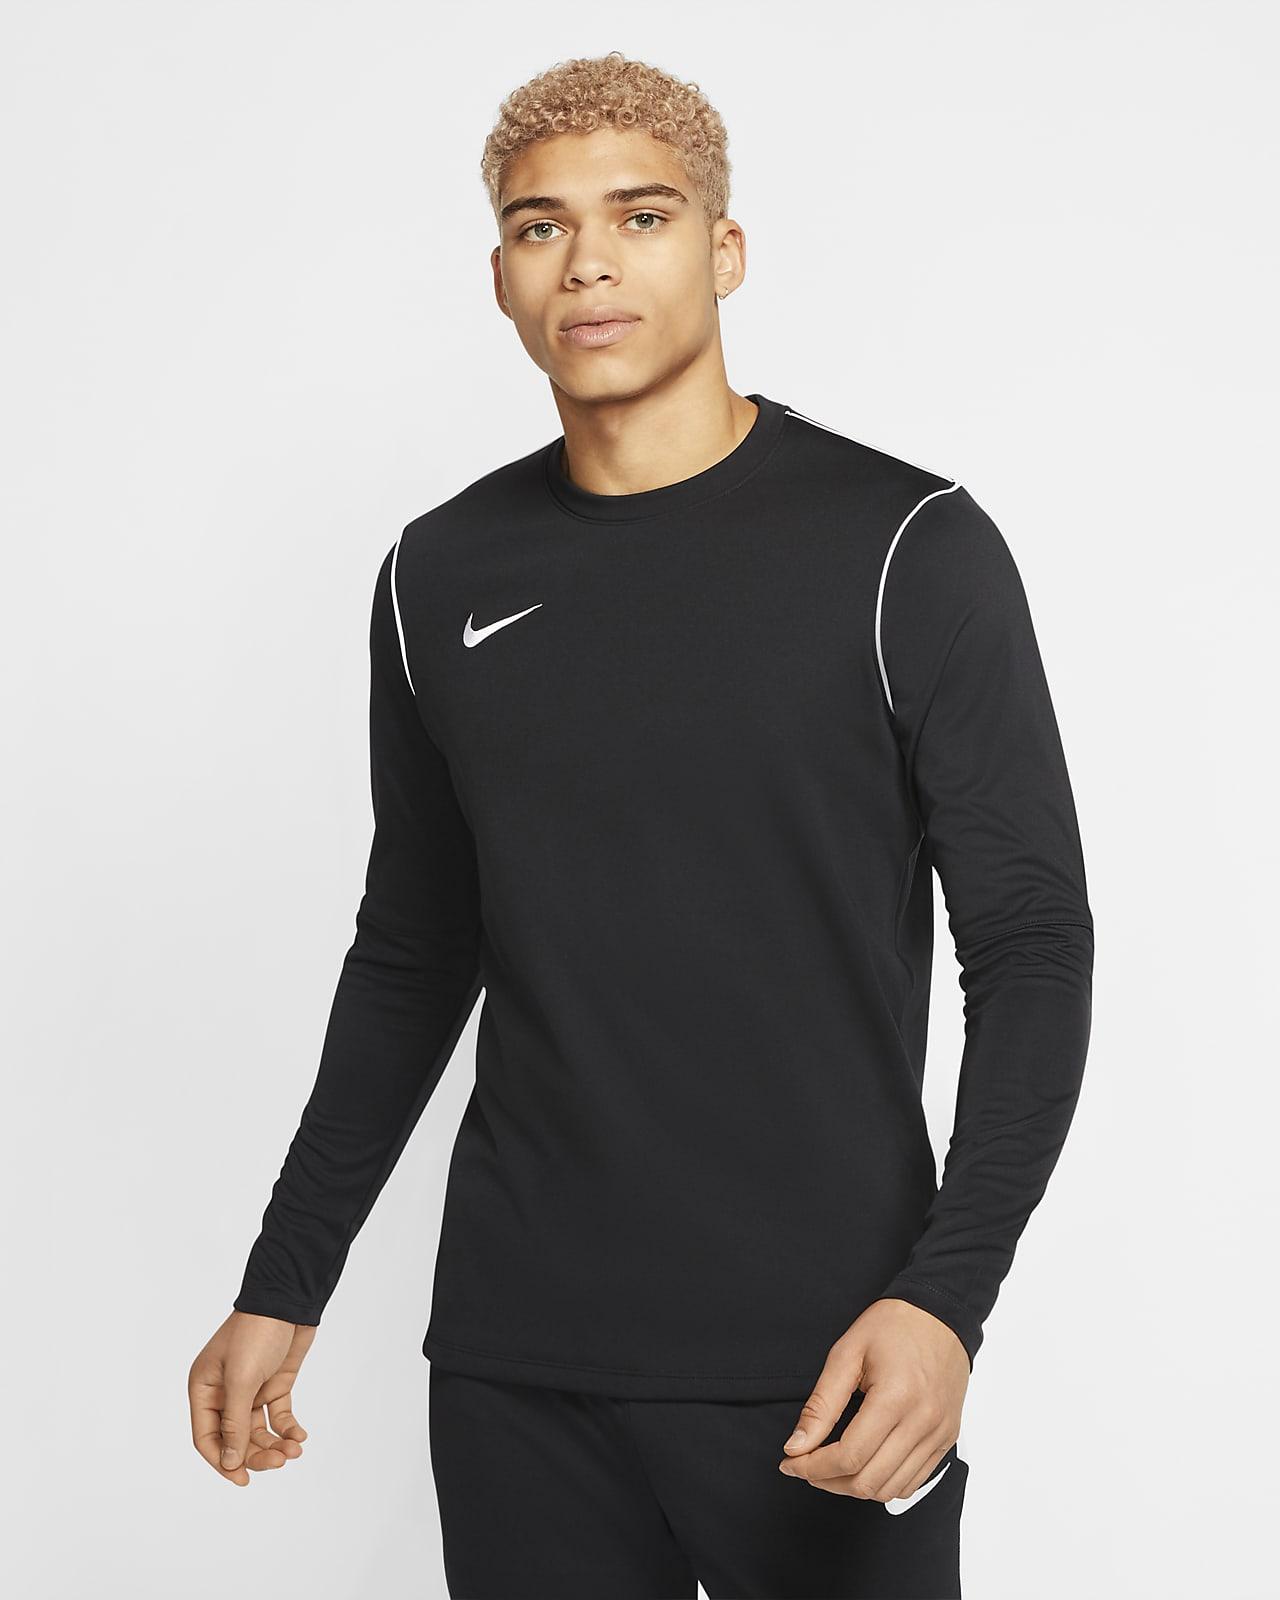 Nike Dri-FIT Men's Long-Sleeve Soccer Top